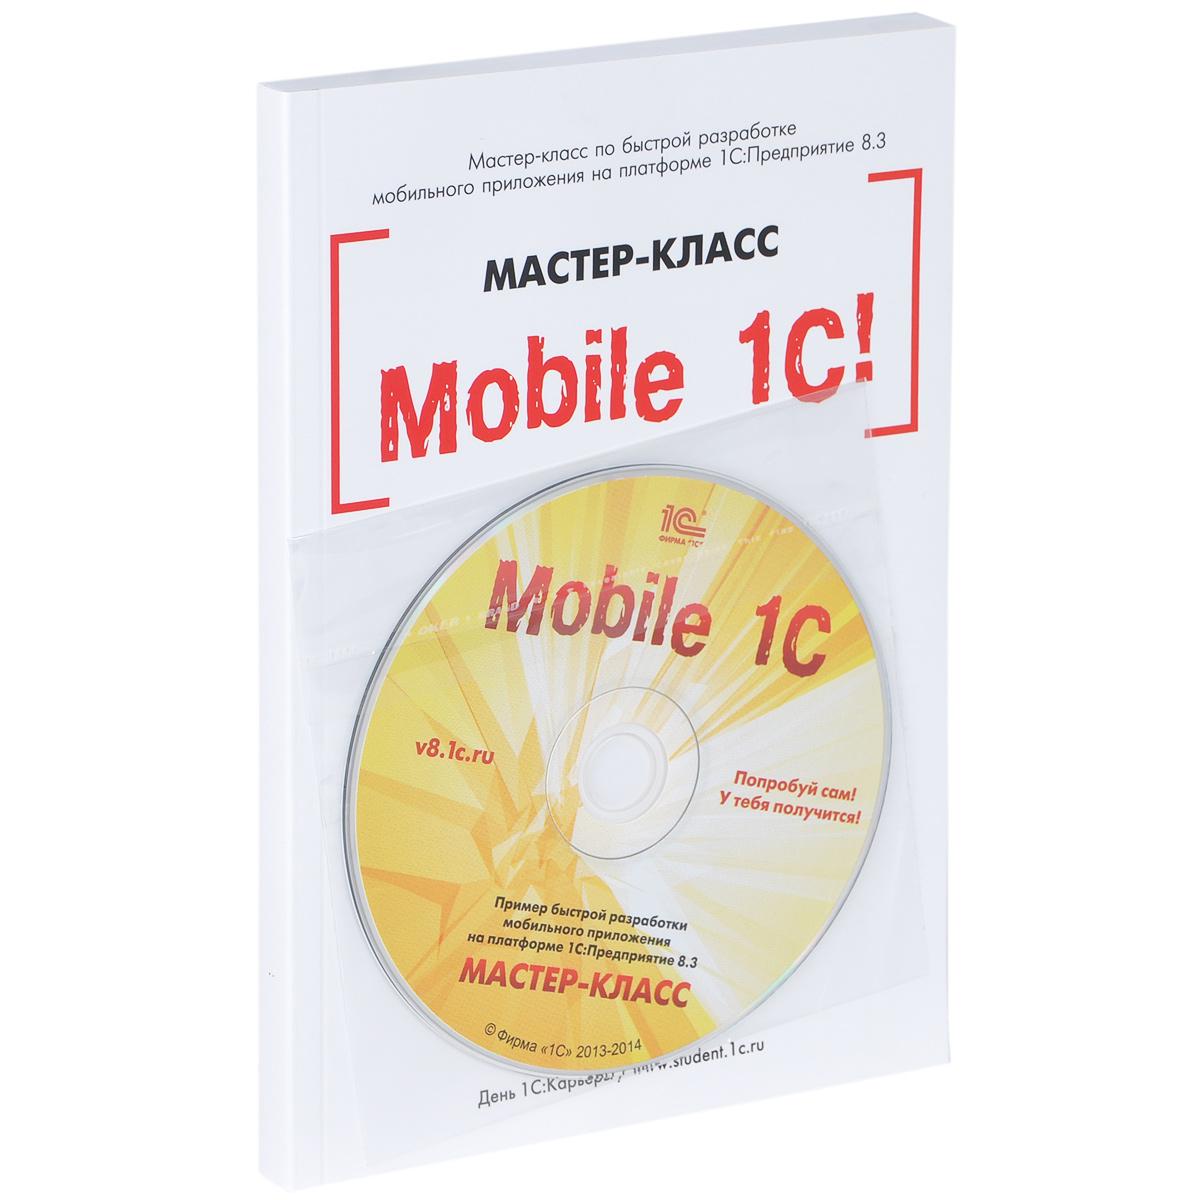 Mobile 1С. Пример быстрой разработки мобильного приложения на платформе 1С:Предприятие 8.3. Мастер-класс (+ CD-ROM)